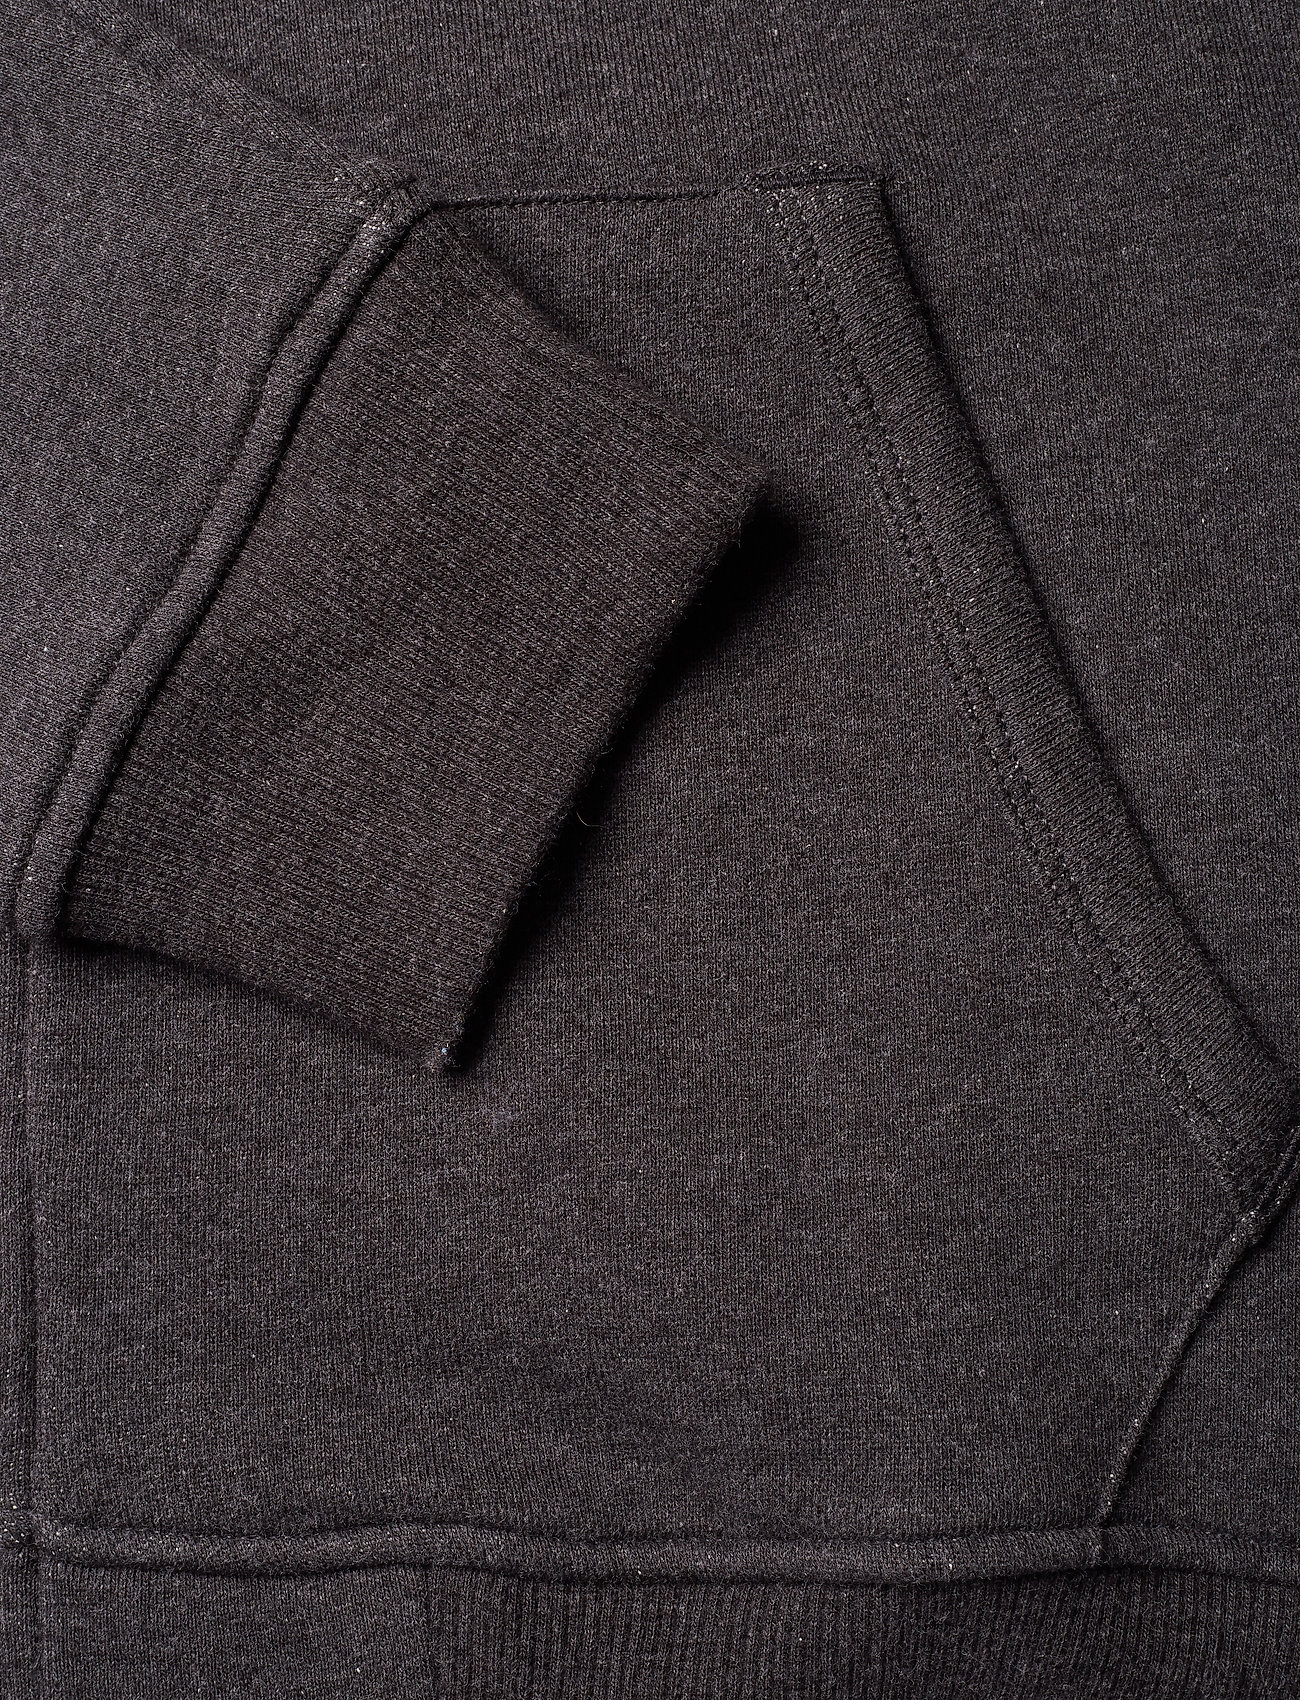 Lyle & Scott Zip Through Hoodie - Sweatshirts CHARCOAL MARL - Menn Klær